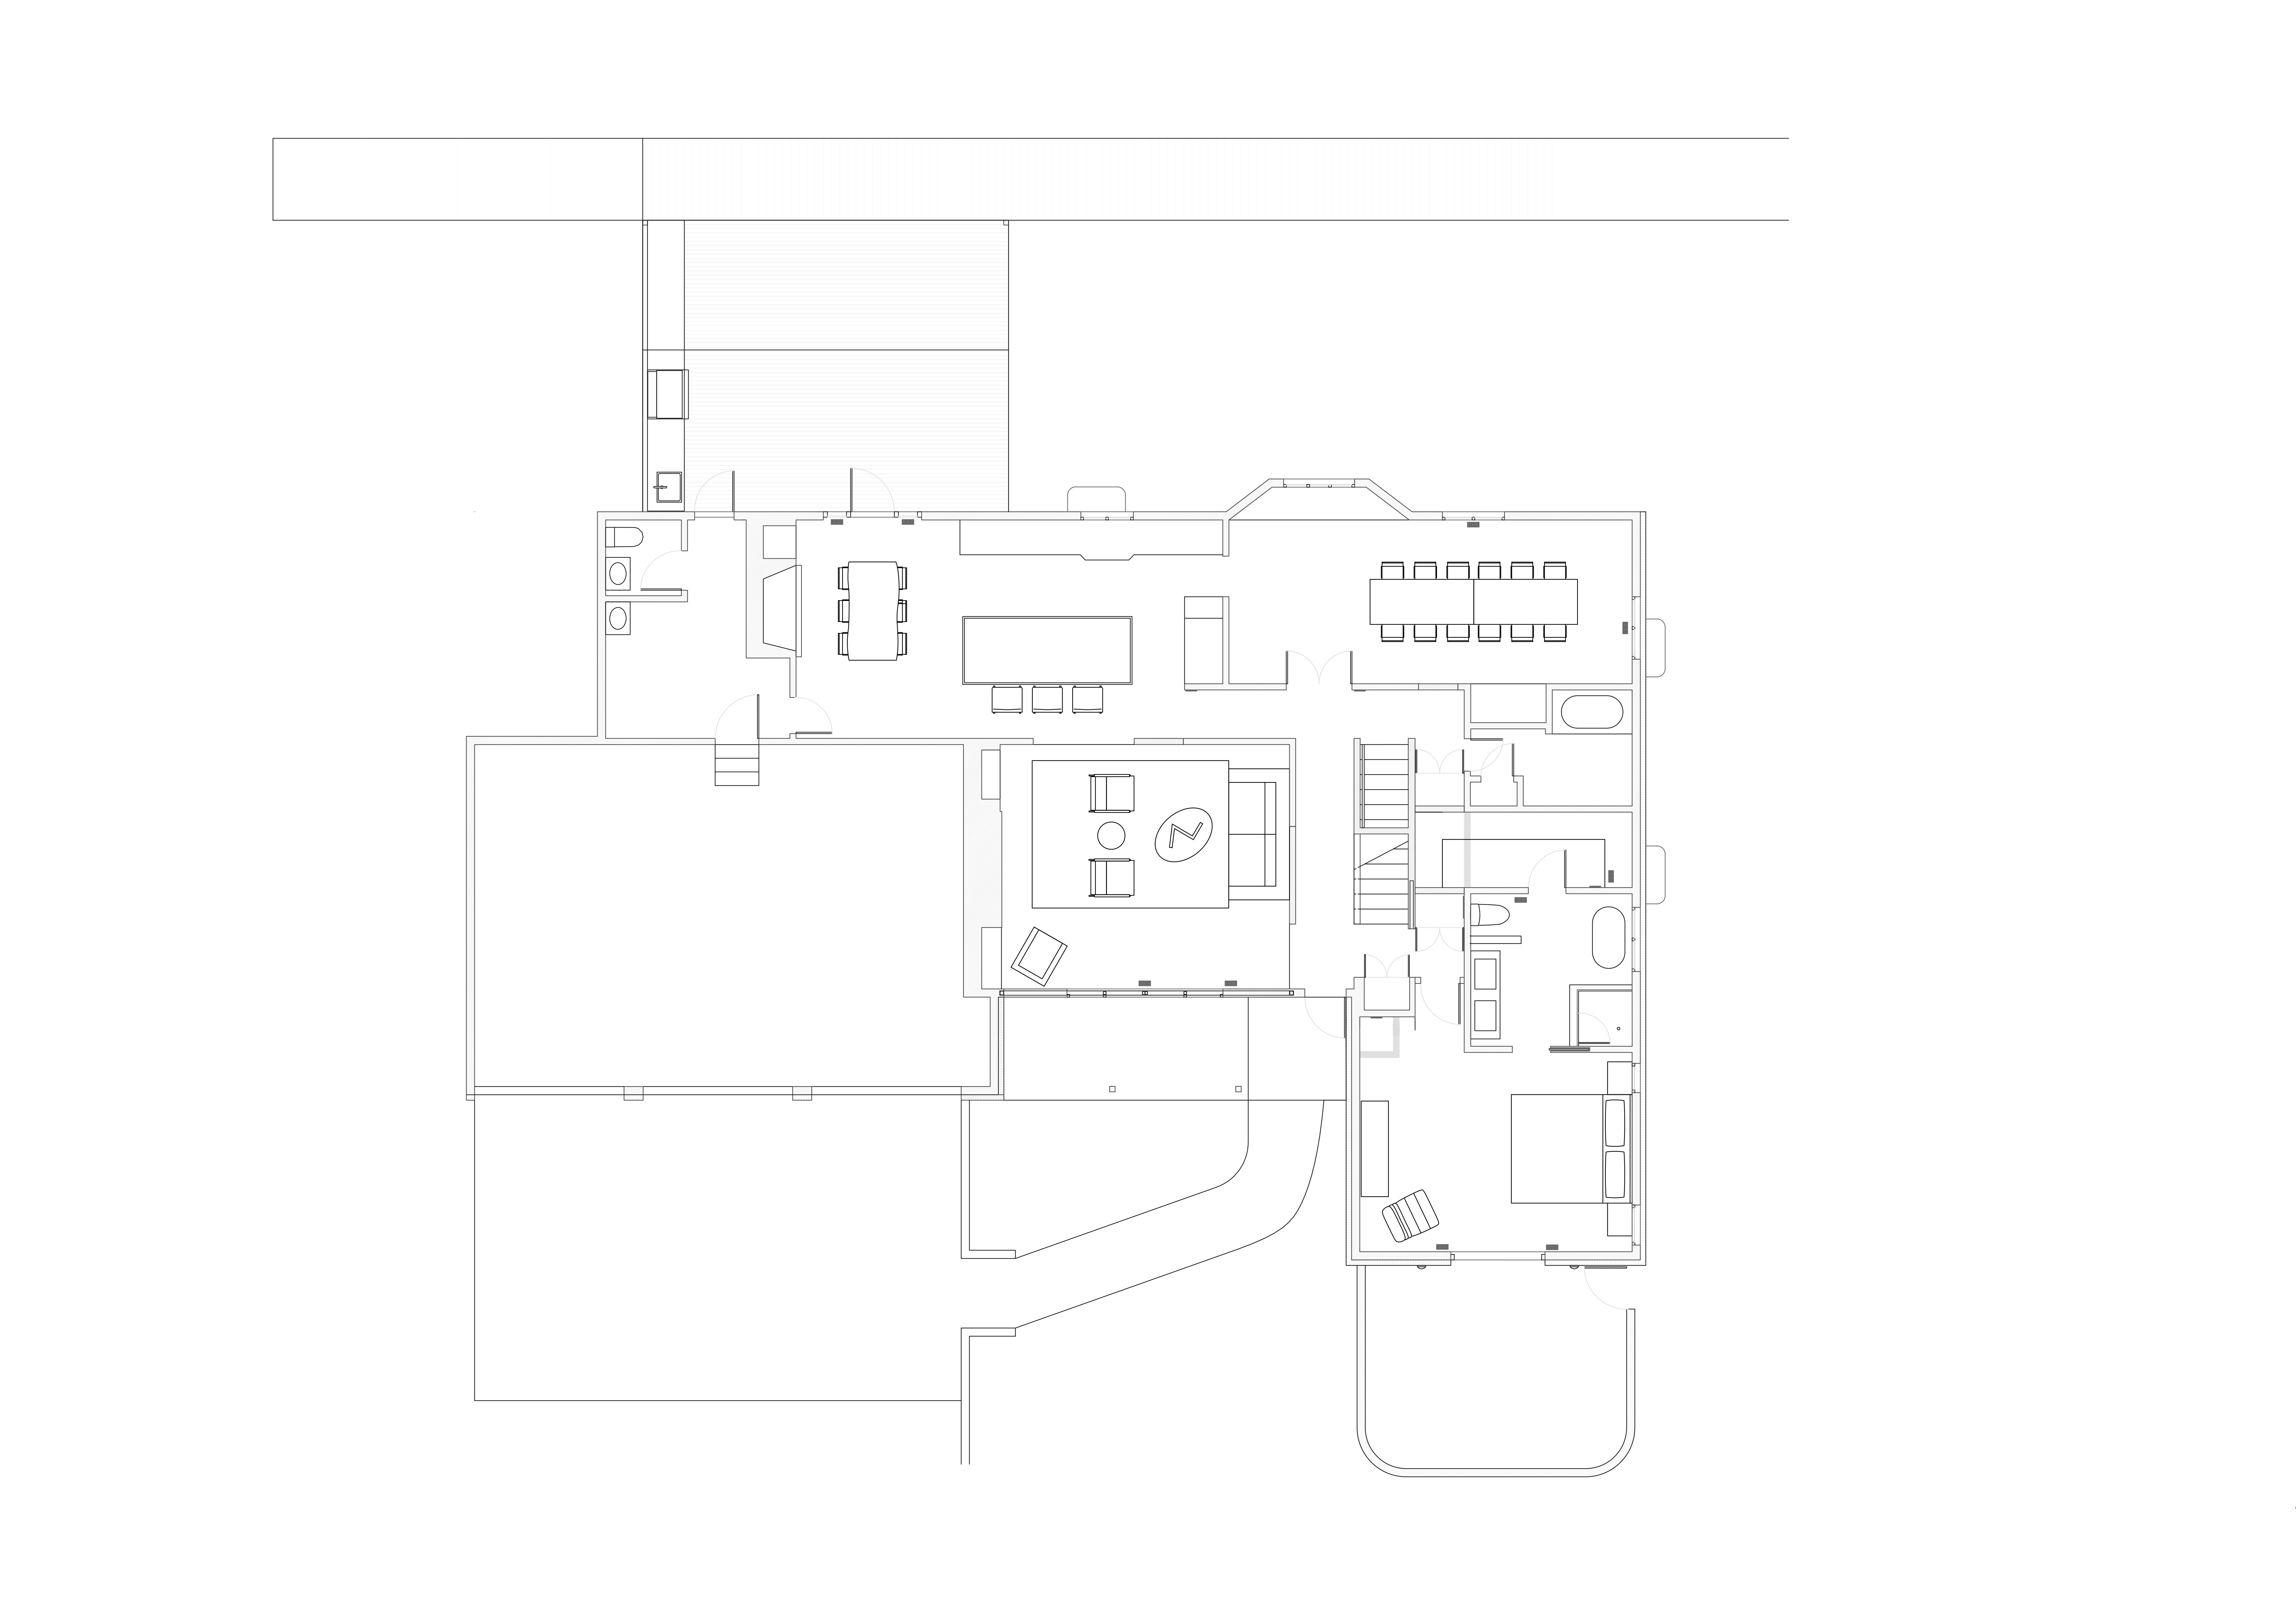 BOULDER_Clean Plans-Model 3